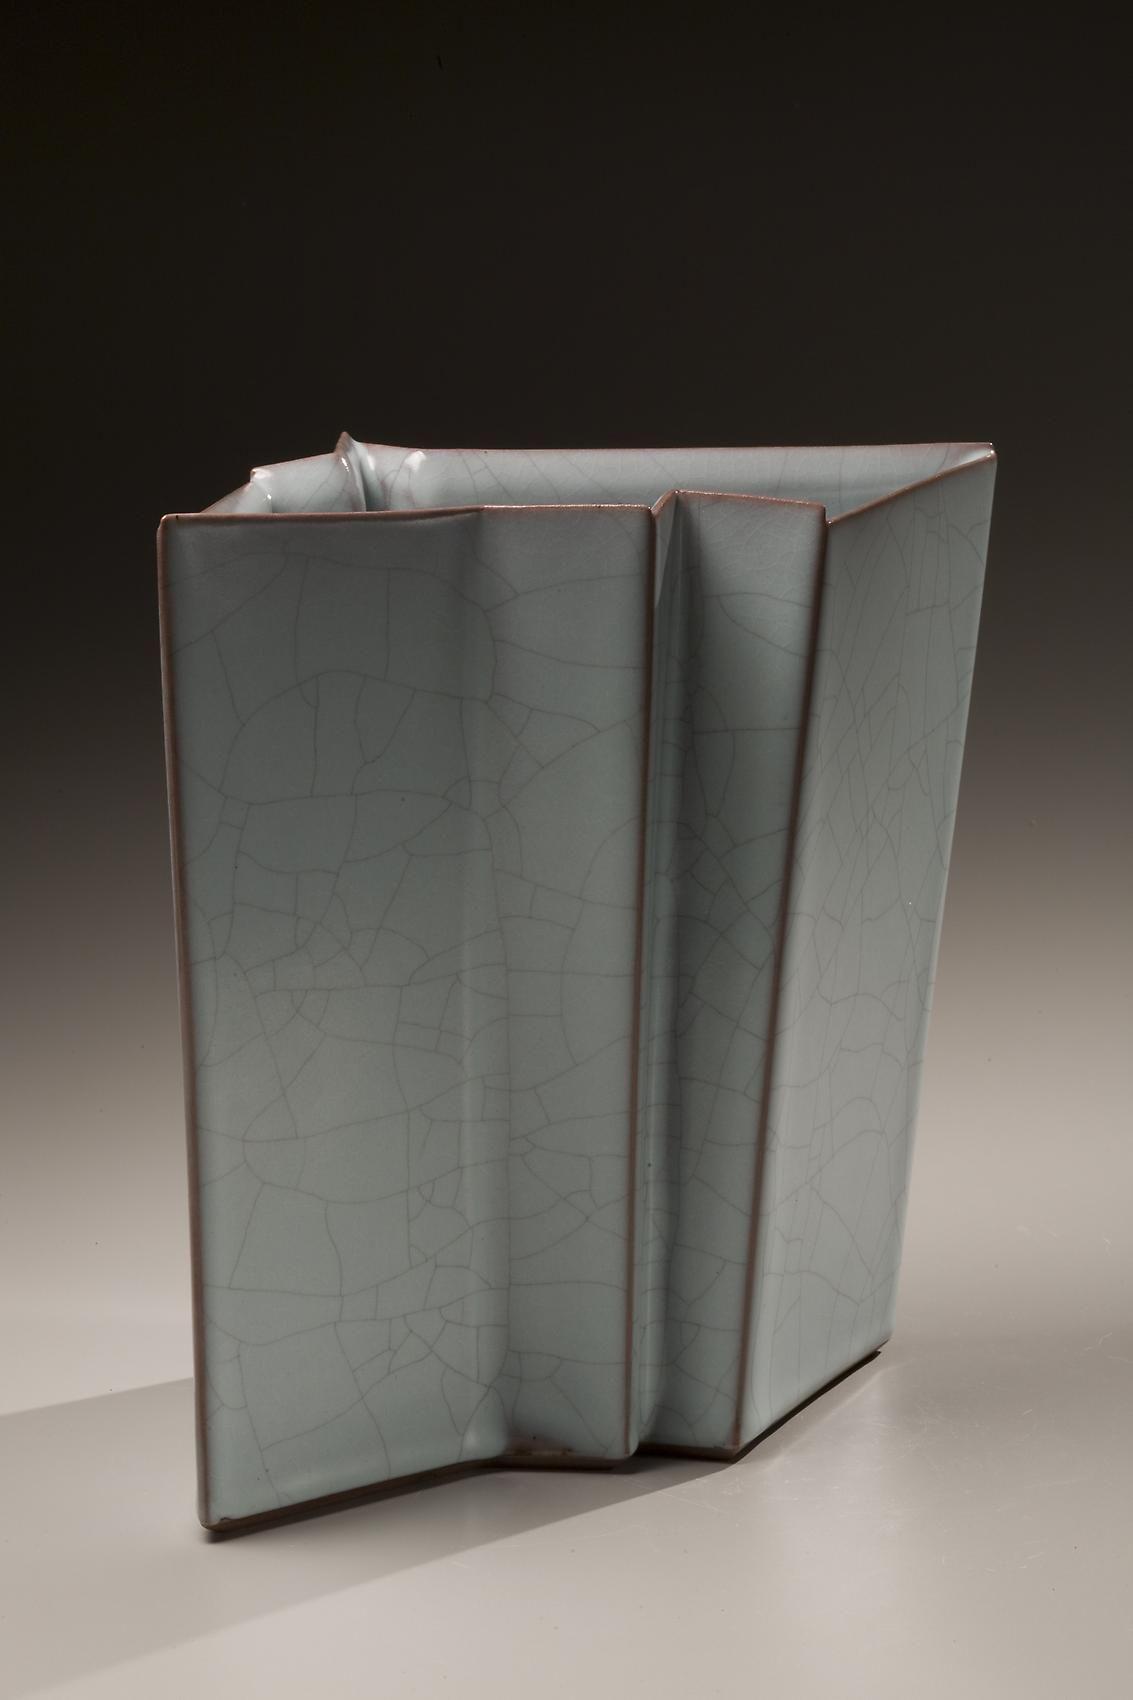 Takagaki Atsushi (b. 1946)